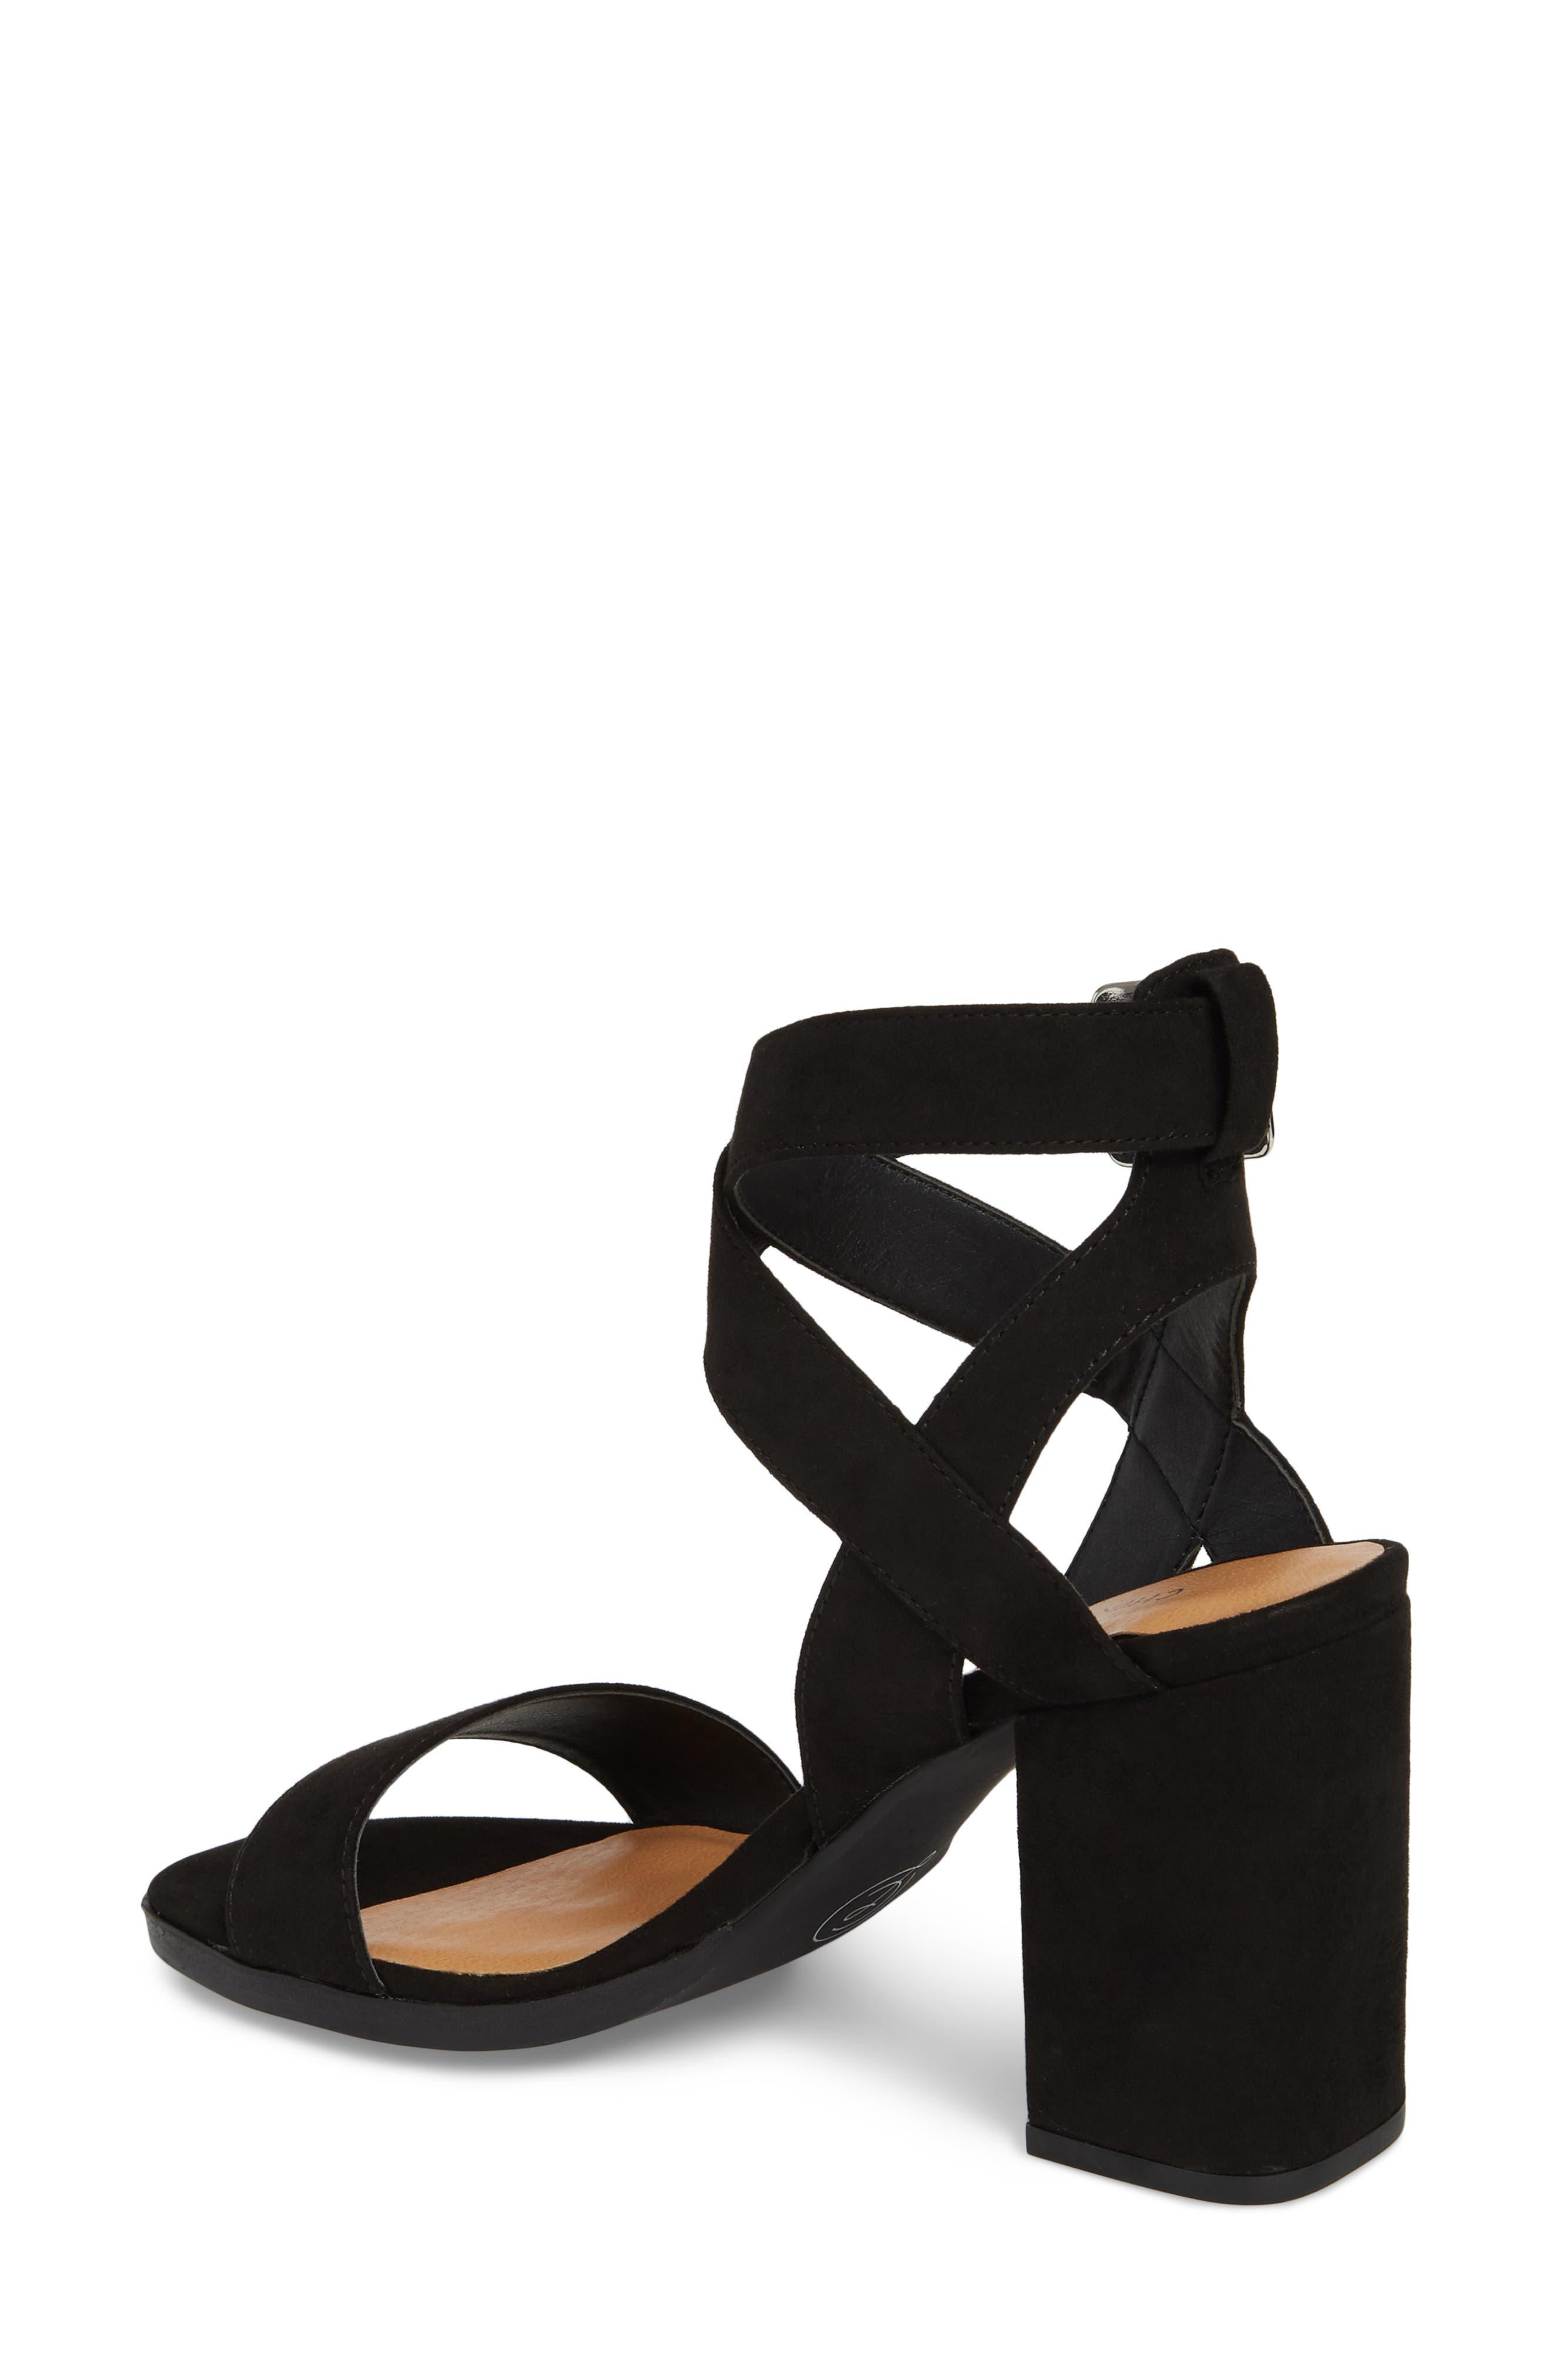 Stassi Block Heel Sandal,                             Alternate thumbnail 2, color,                             Black